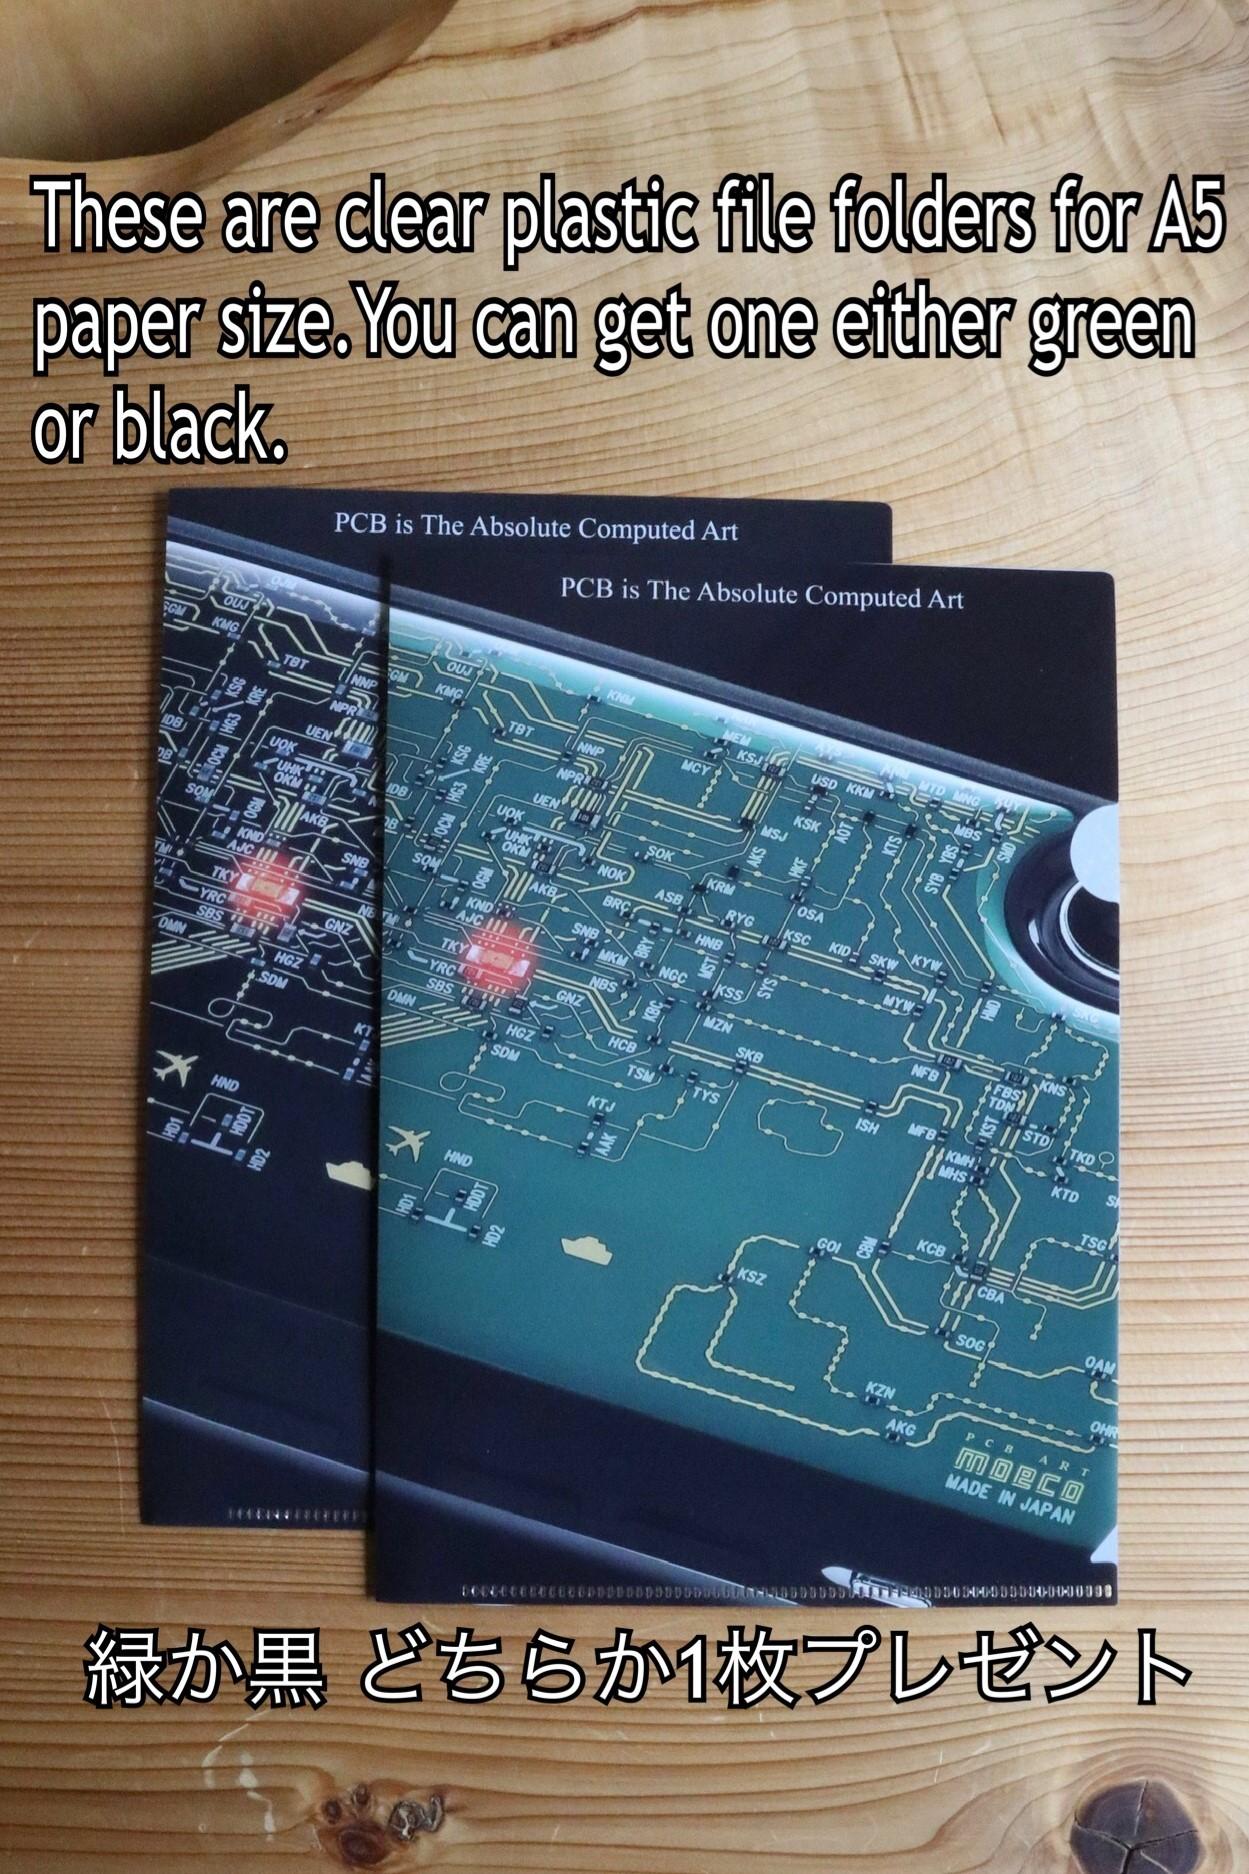 FLASH 東京回路線図 iPhone SE(第1世代)/5/5s  ケース 緑【東京回路線図A5クリアファイルをプレゼント】